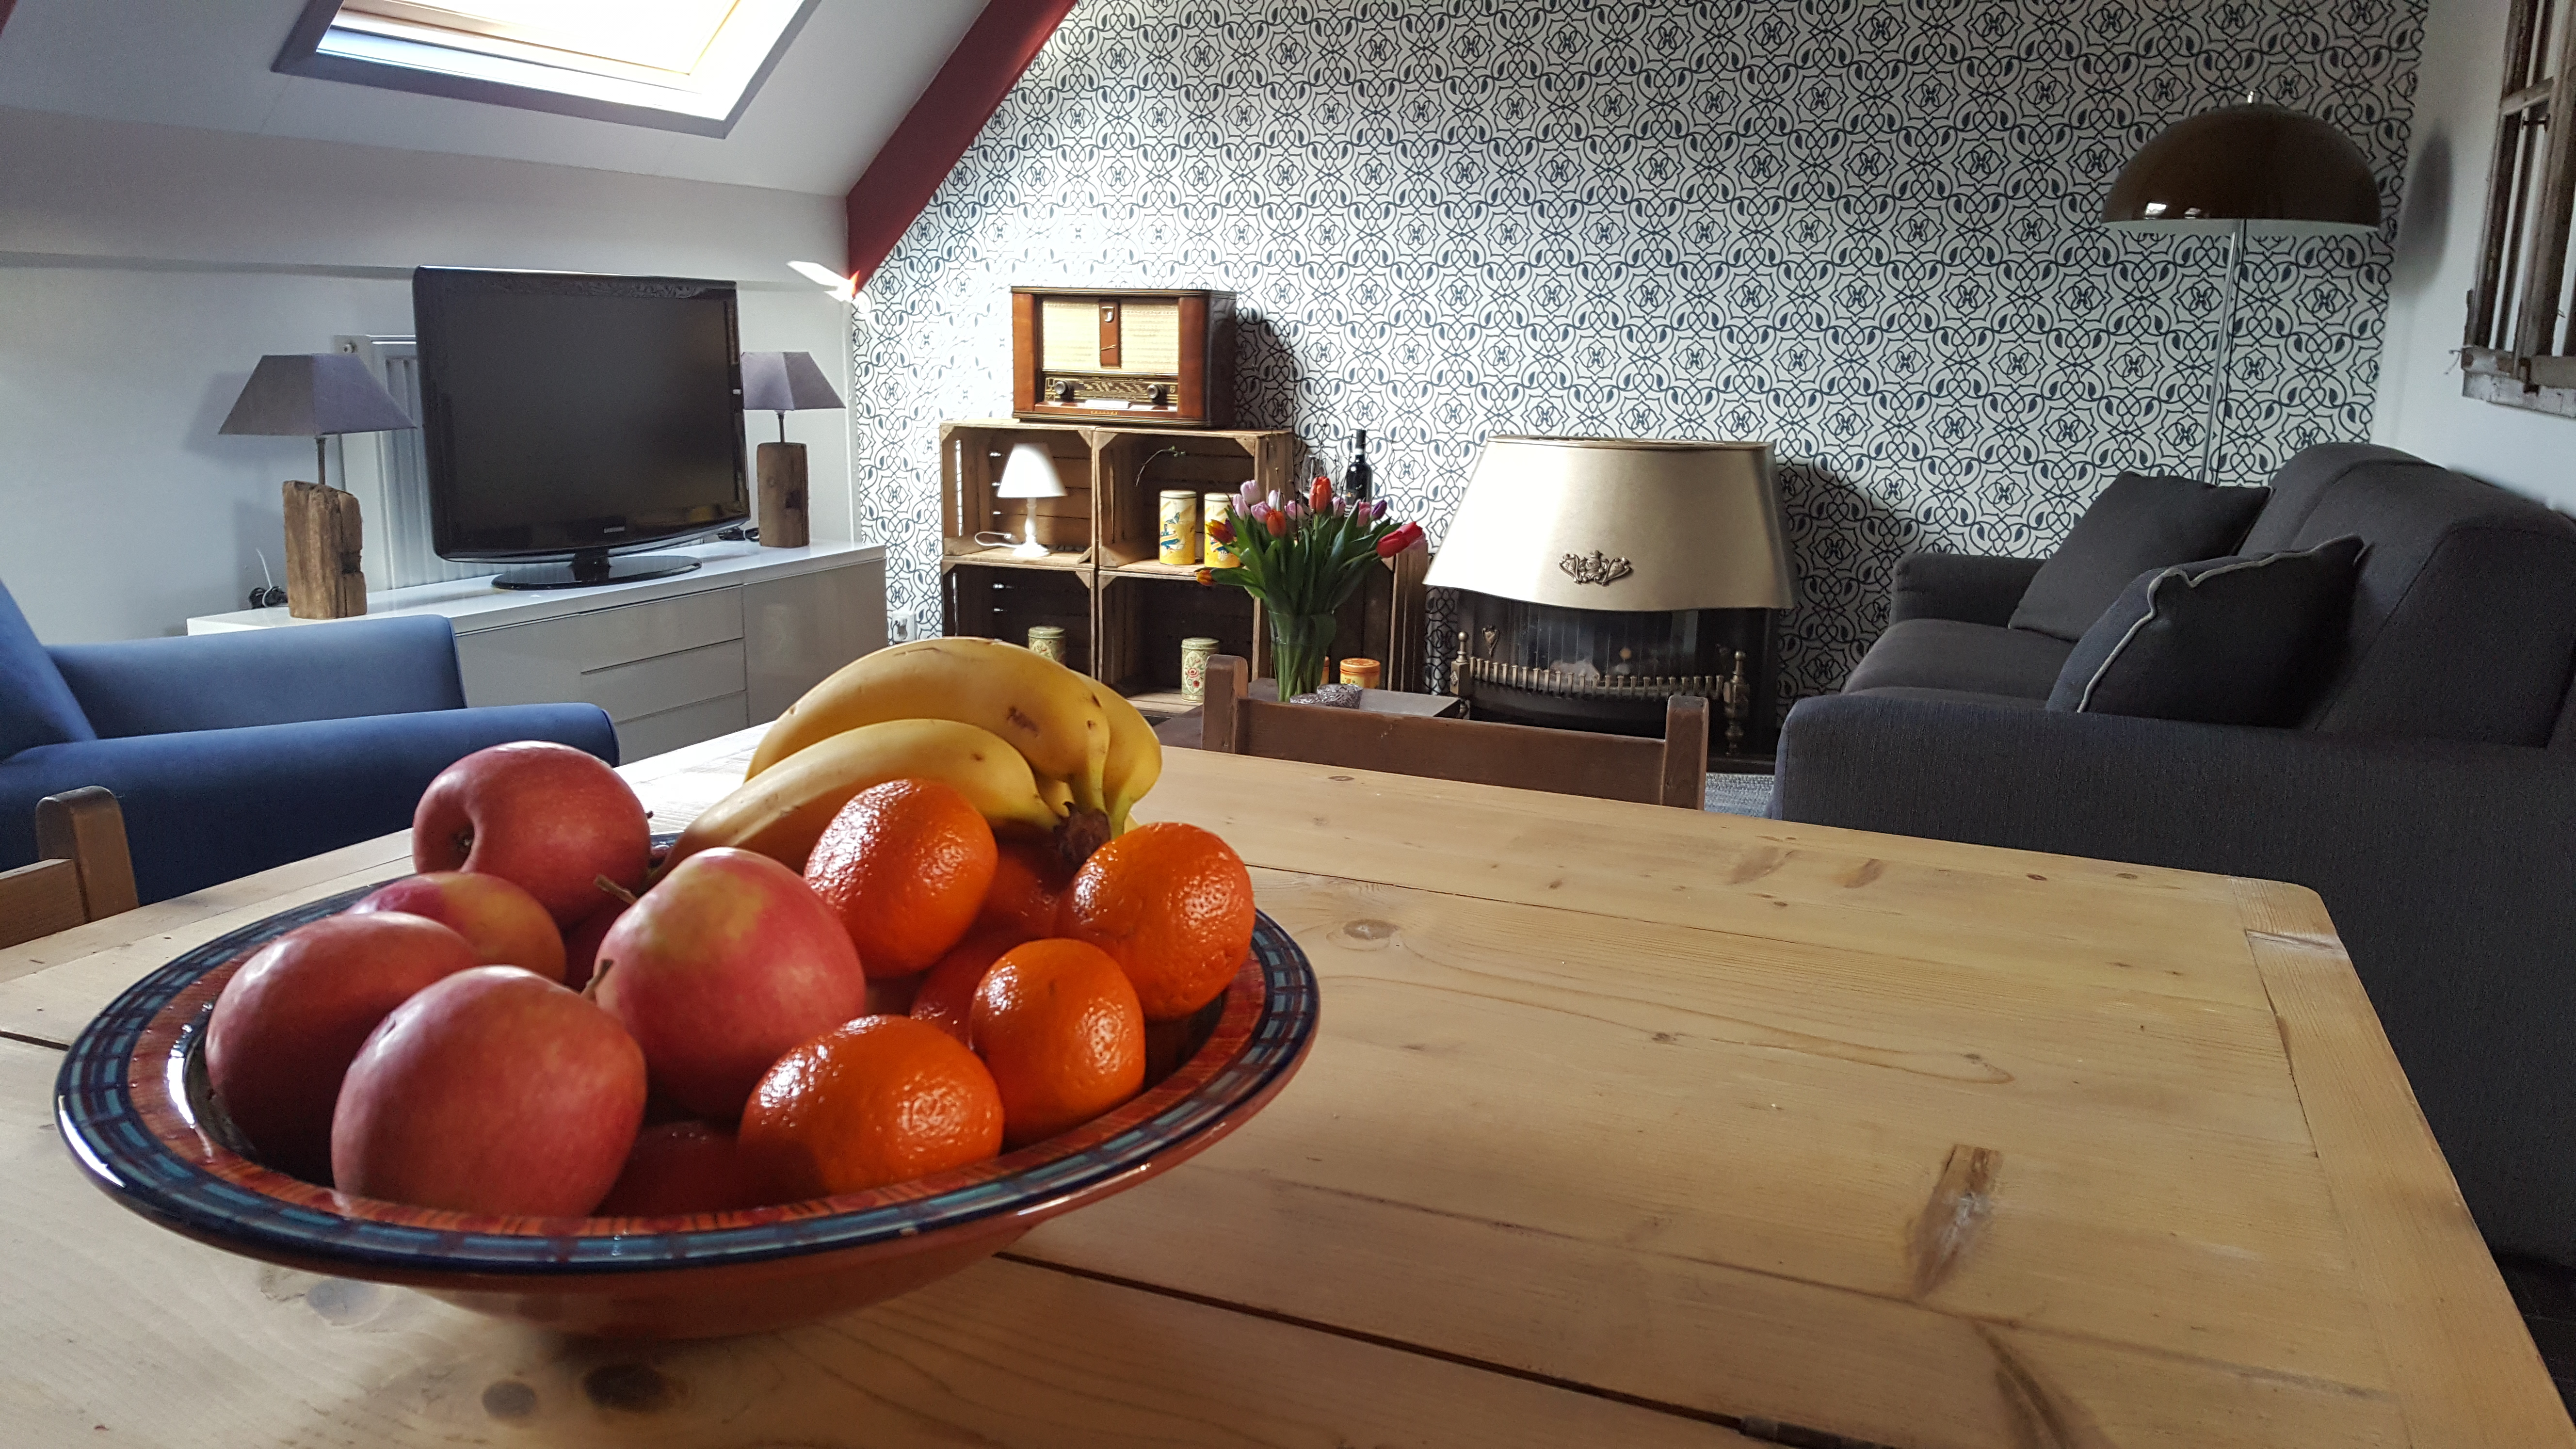 Kamer B&B Lant van Beloften Vlissingen Zeeland Vakantiewoning Ferienwohnung Strand